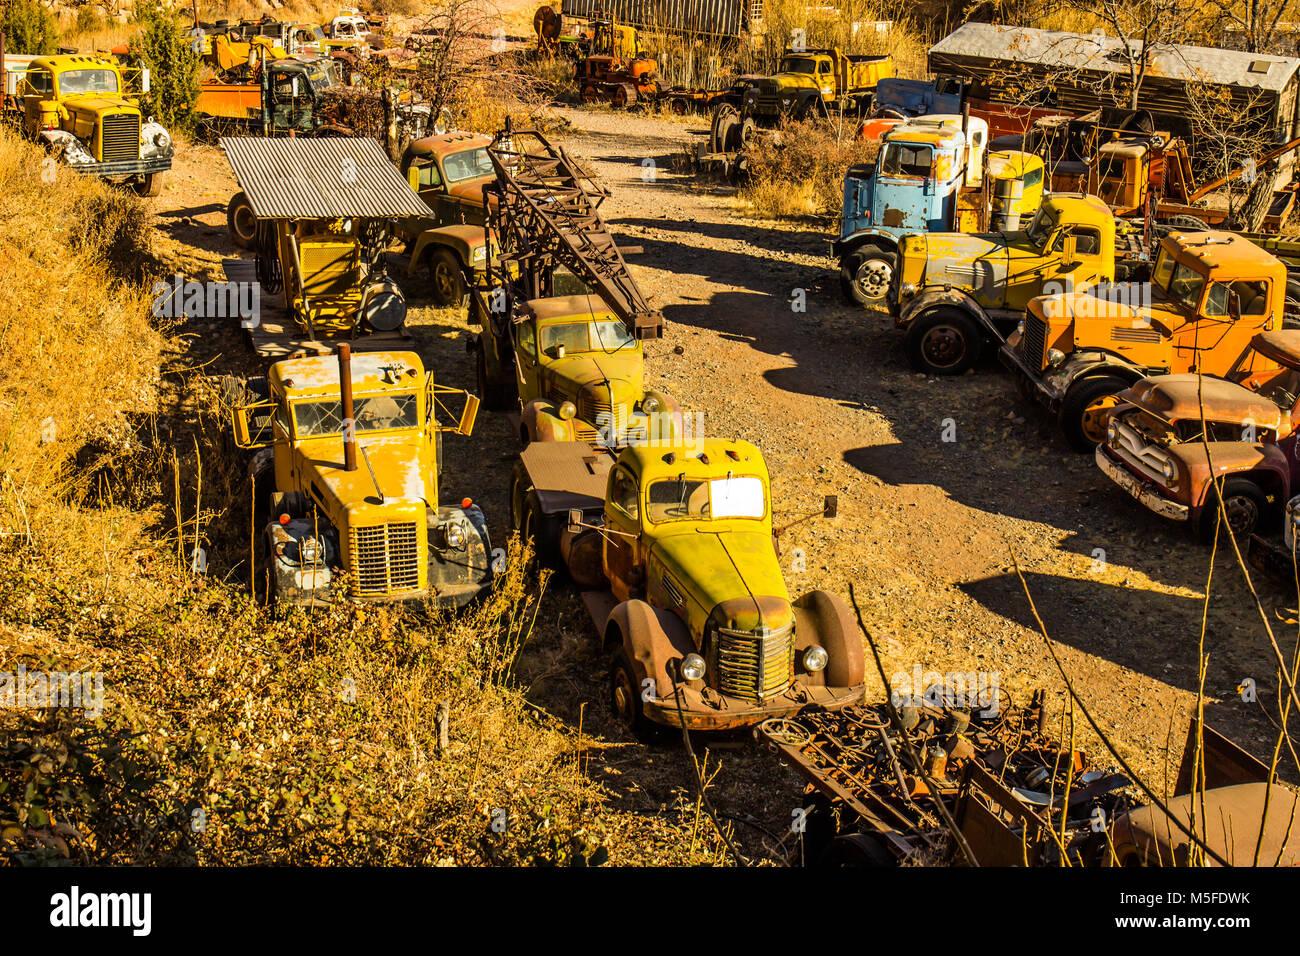 Graveyard Of Vintage Heavy Duty Vehicles In Salvage Yard